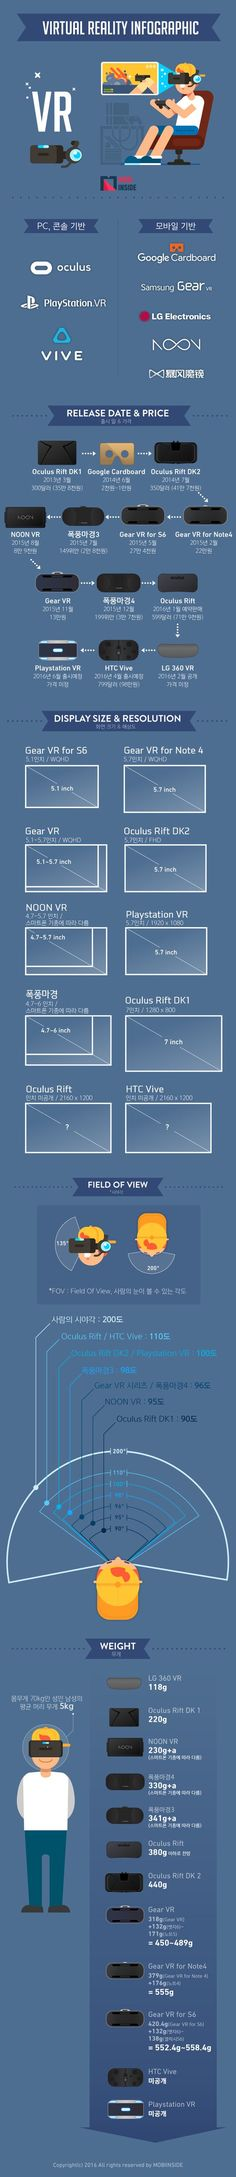 VR-Infographic